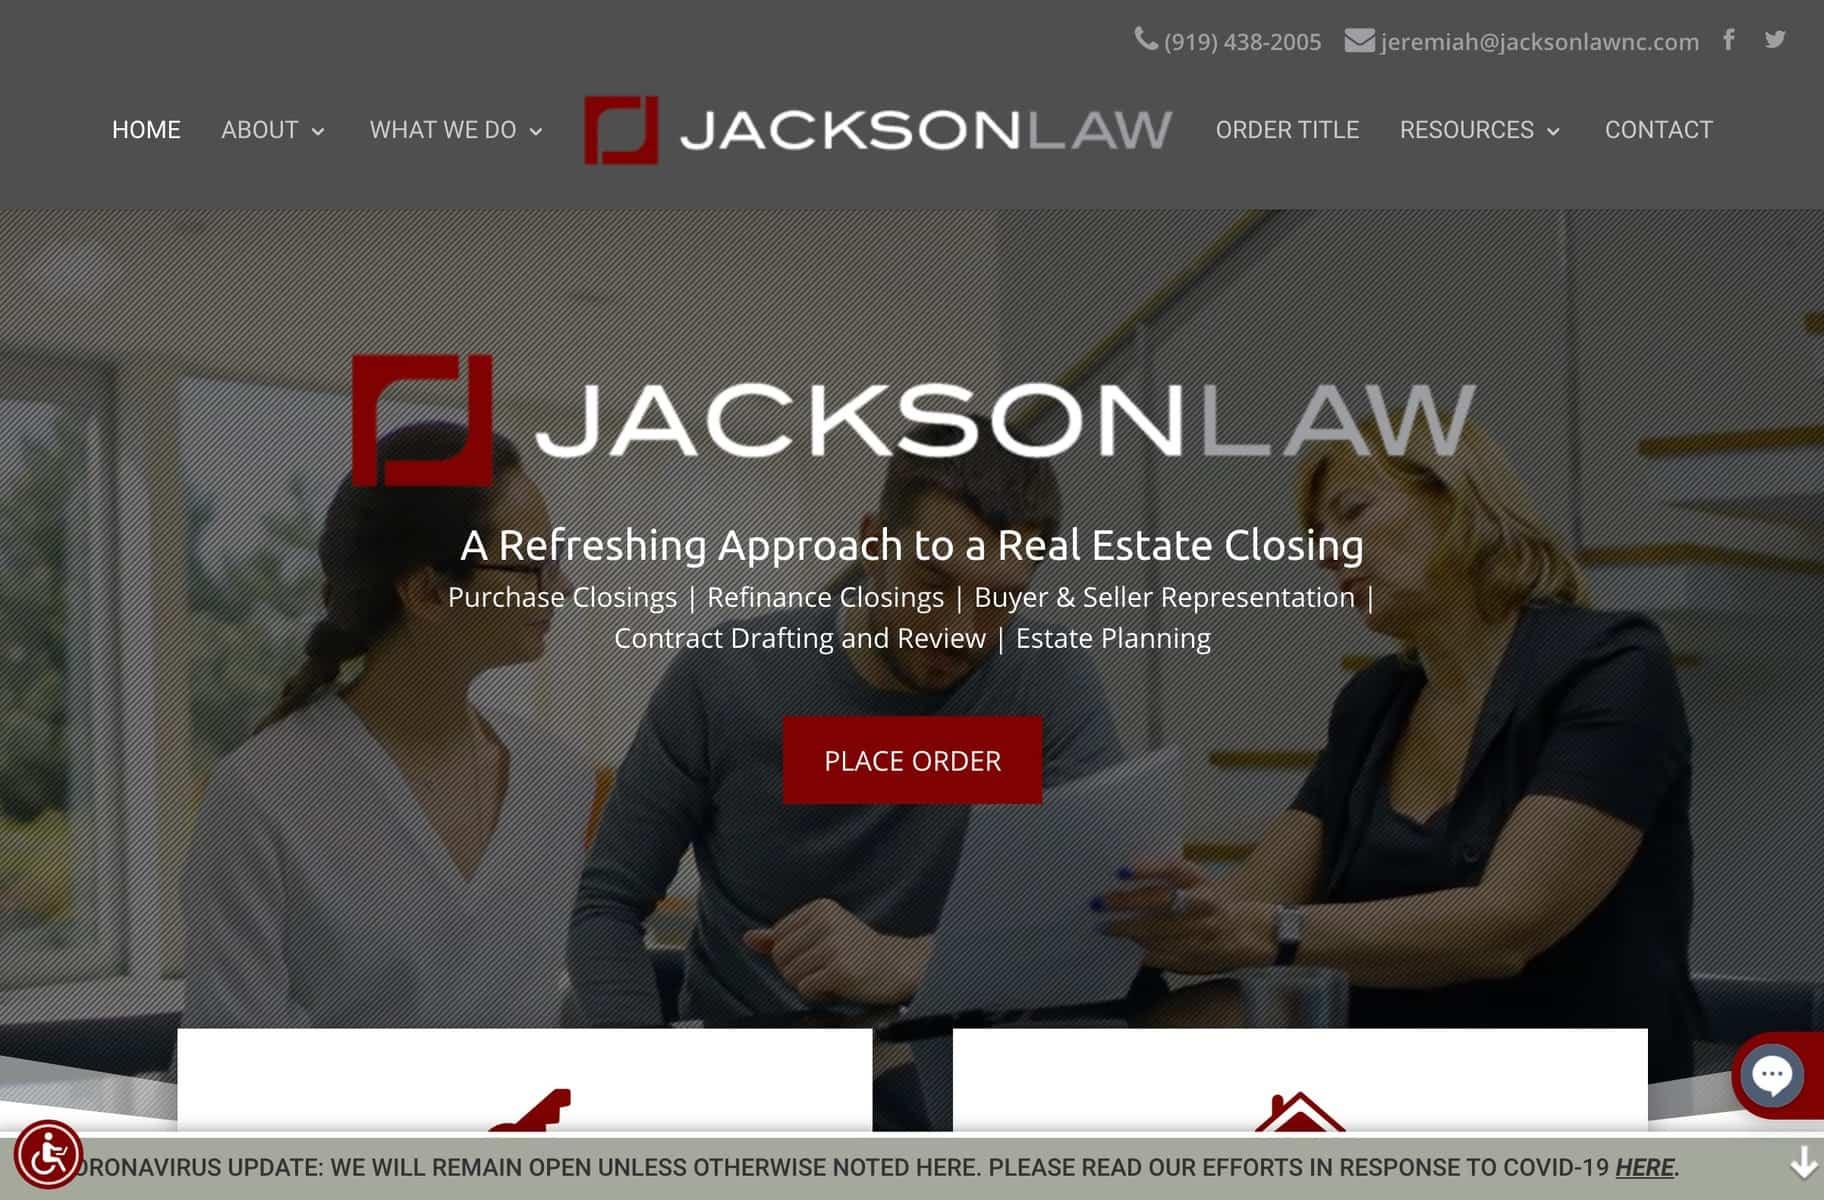 Jackson Law Website Example